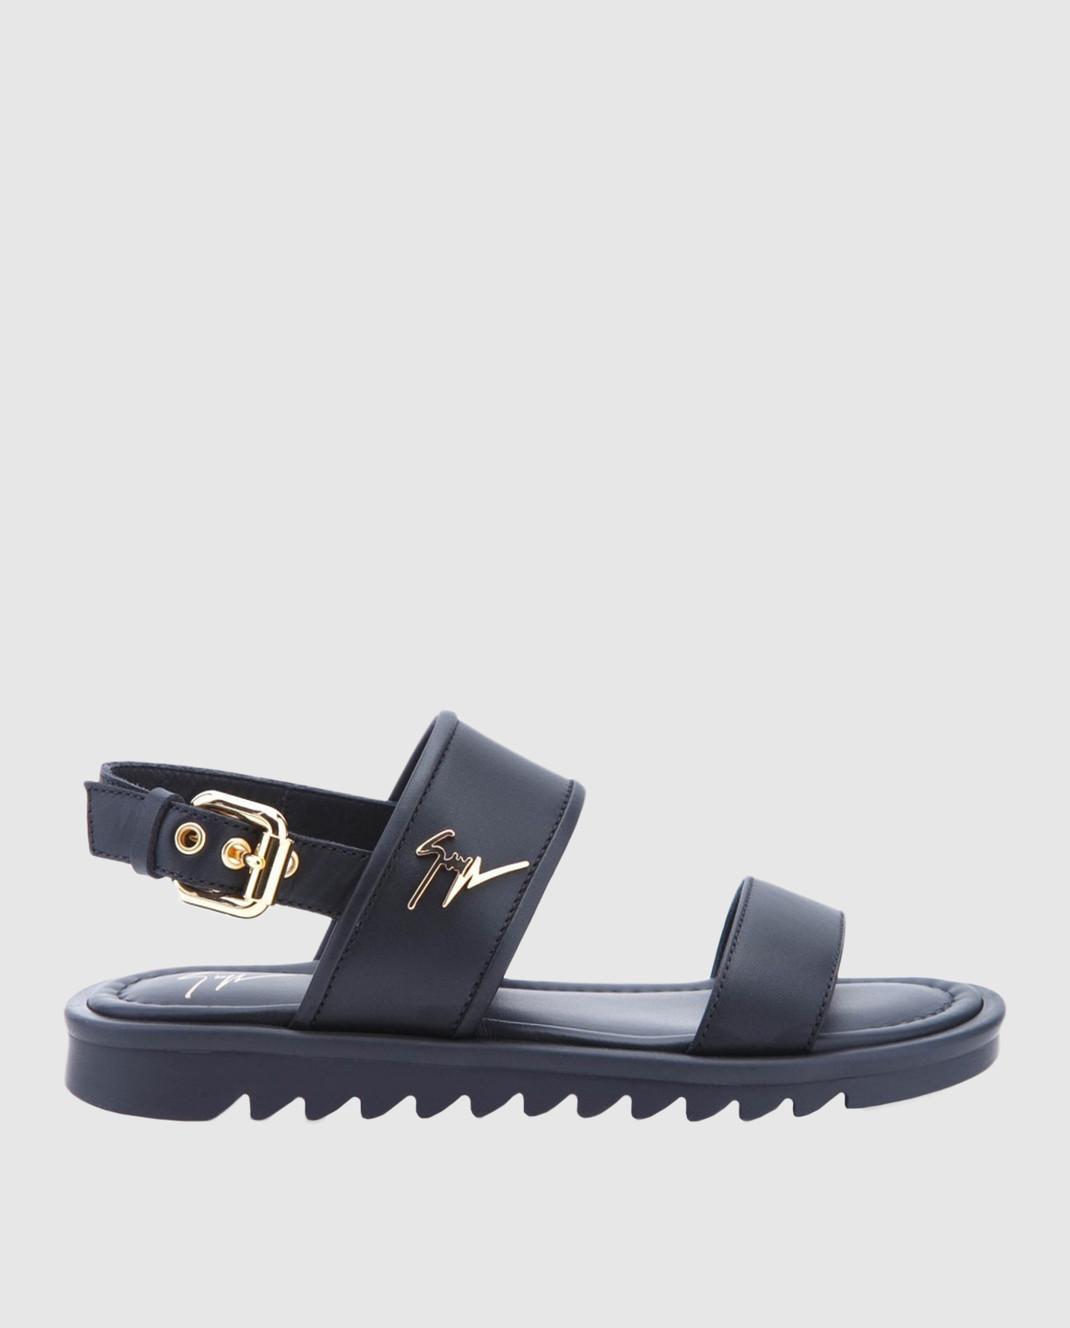 Giuseppe Zanotti Детские черные кожаные сандалии SBE8409001